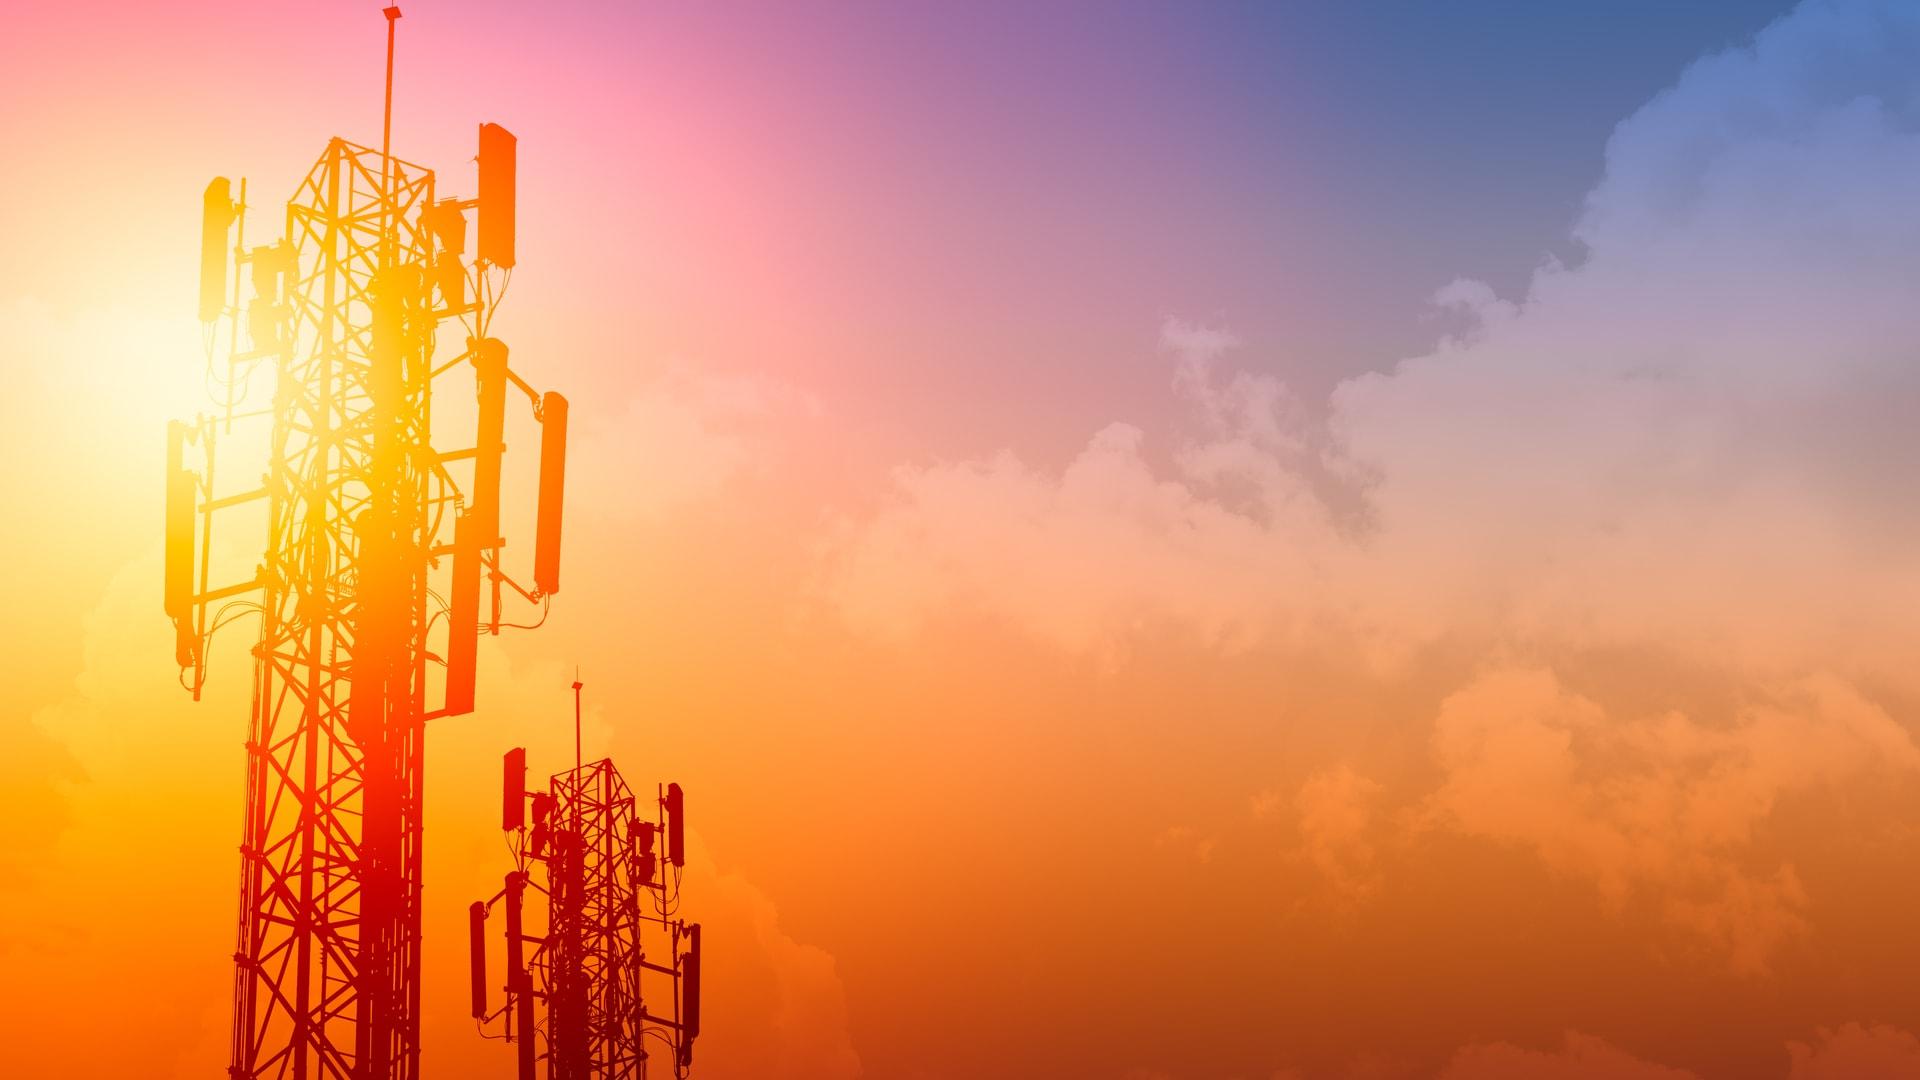 internet mobilny lte tethering limity comcast